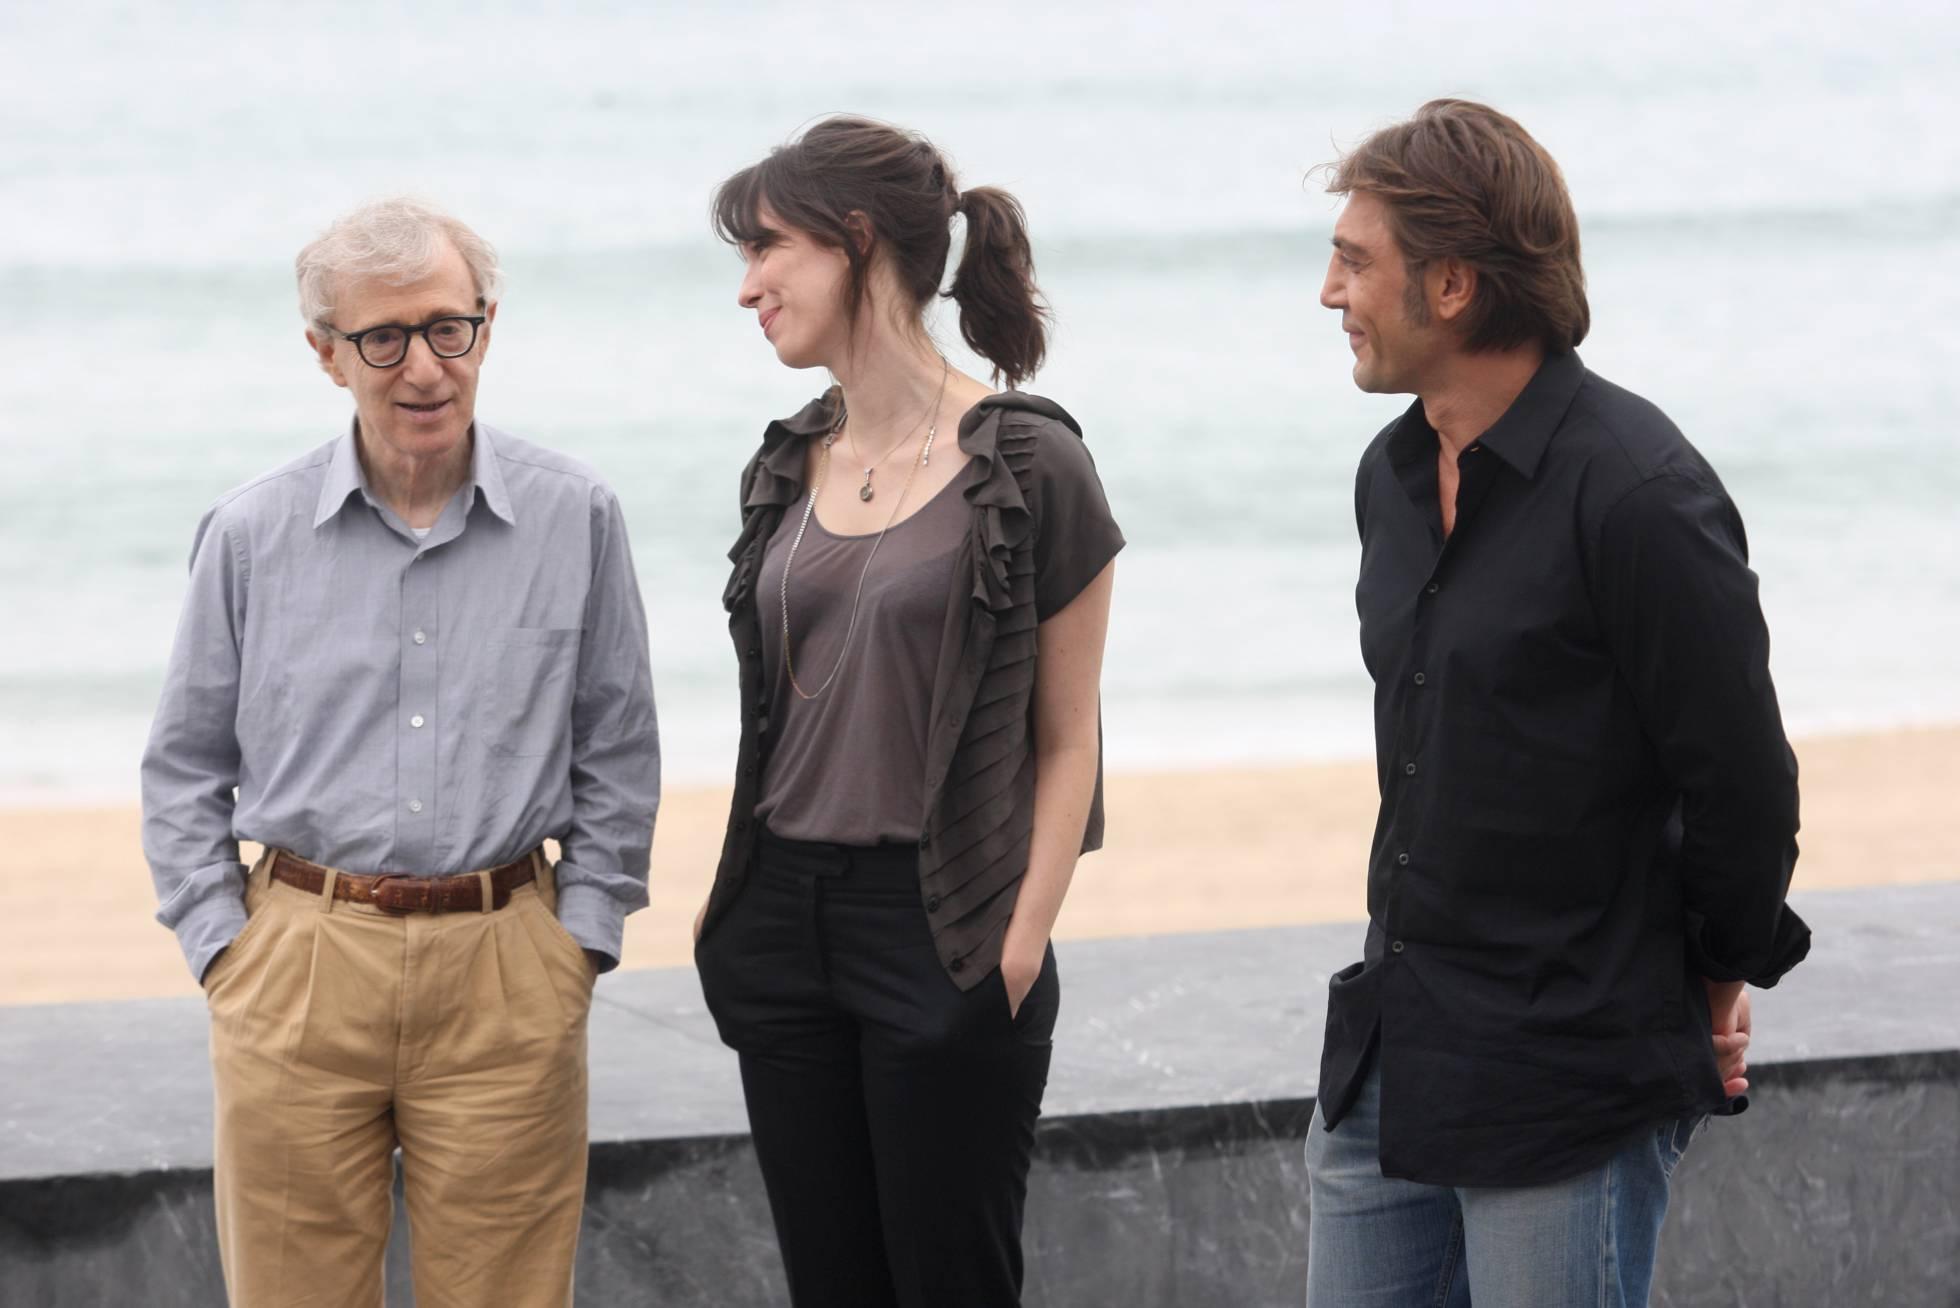 Вуди Аллен ищет места для съемок фильма в Сан-Себастьяне